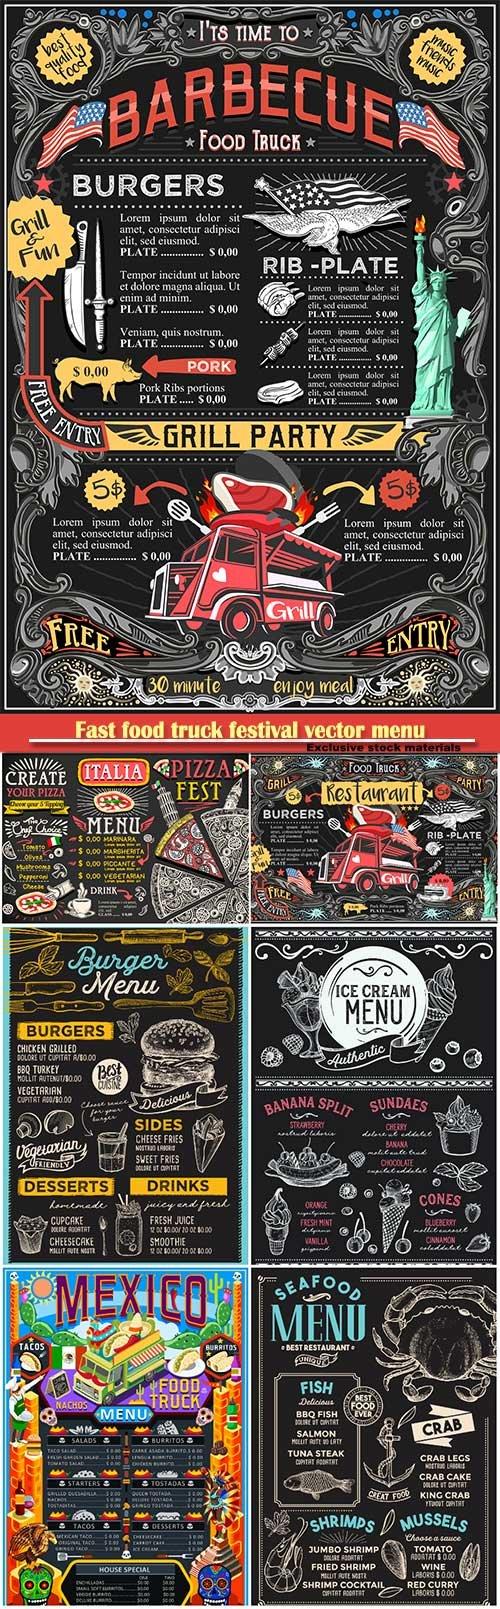 Fast food truck festival vector menu, BBQ grill brochure street food poster design